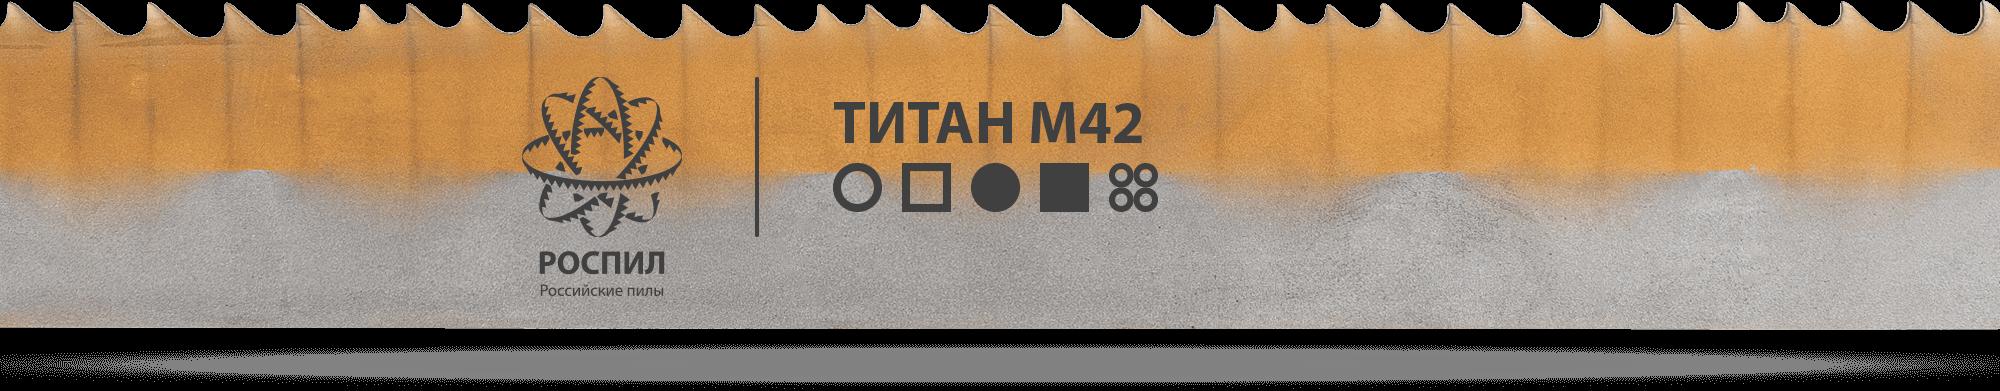 РОСПИЛ Титан М42